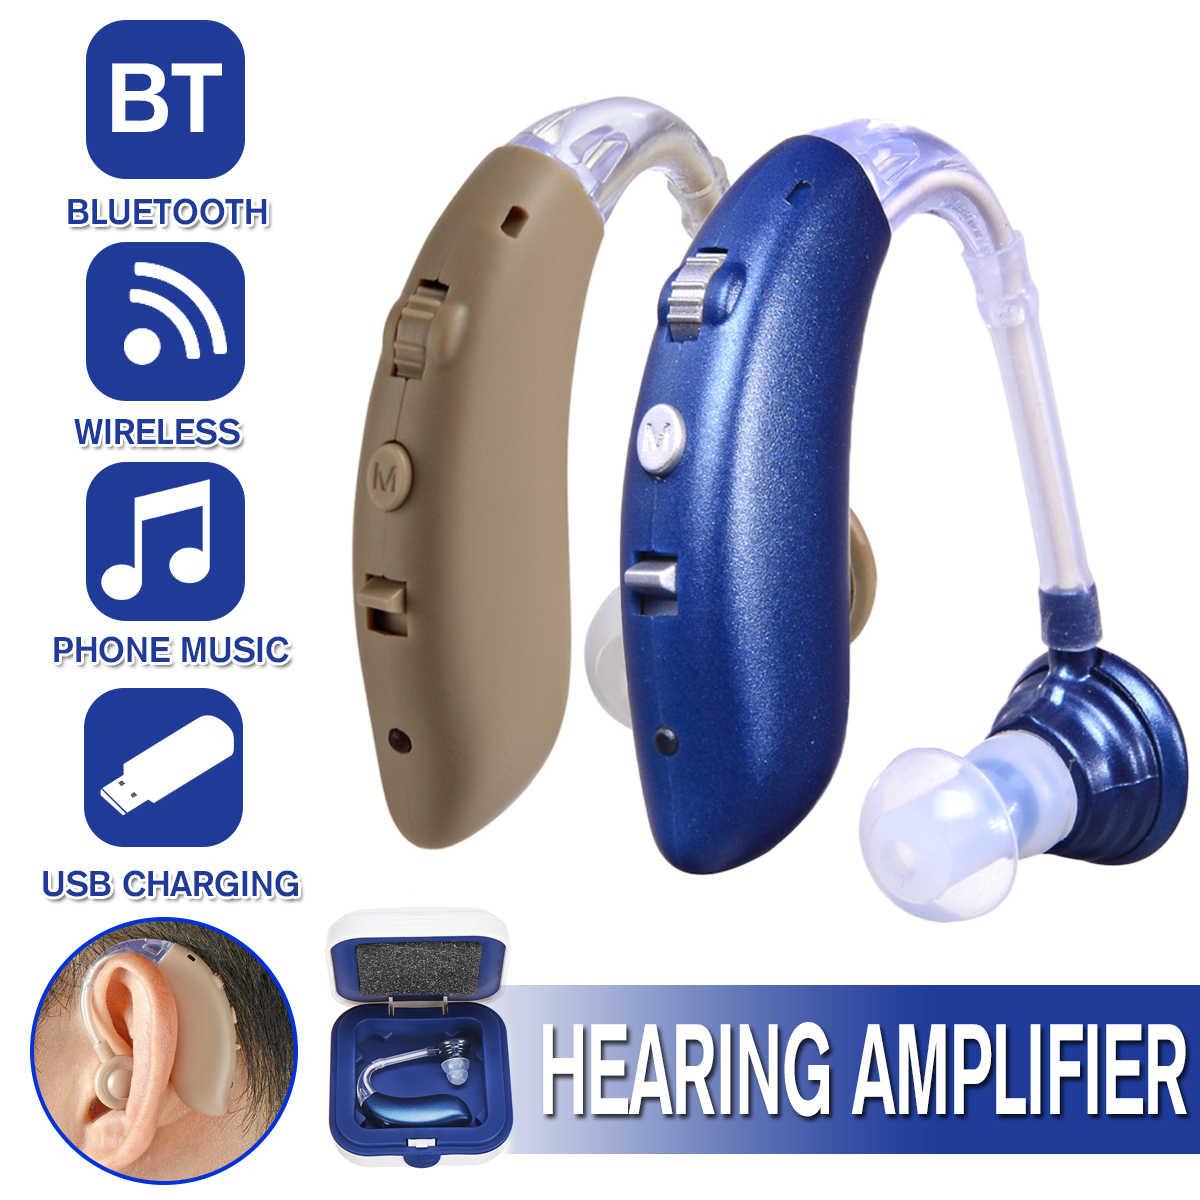 2020 Rechargeablels Baru Di Belakang Telinga USB Alat Bantu Dengar Nirkabel Bluetooth Rechargeable dengan Charger Mini Mendengarkan Perangkat